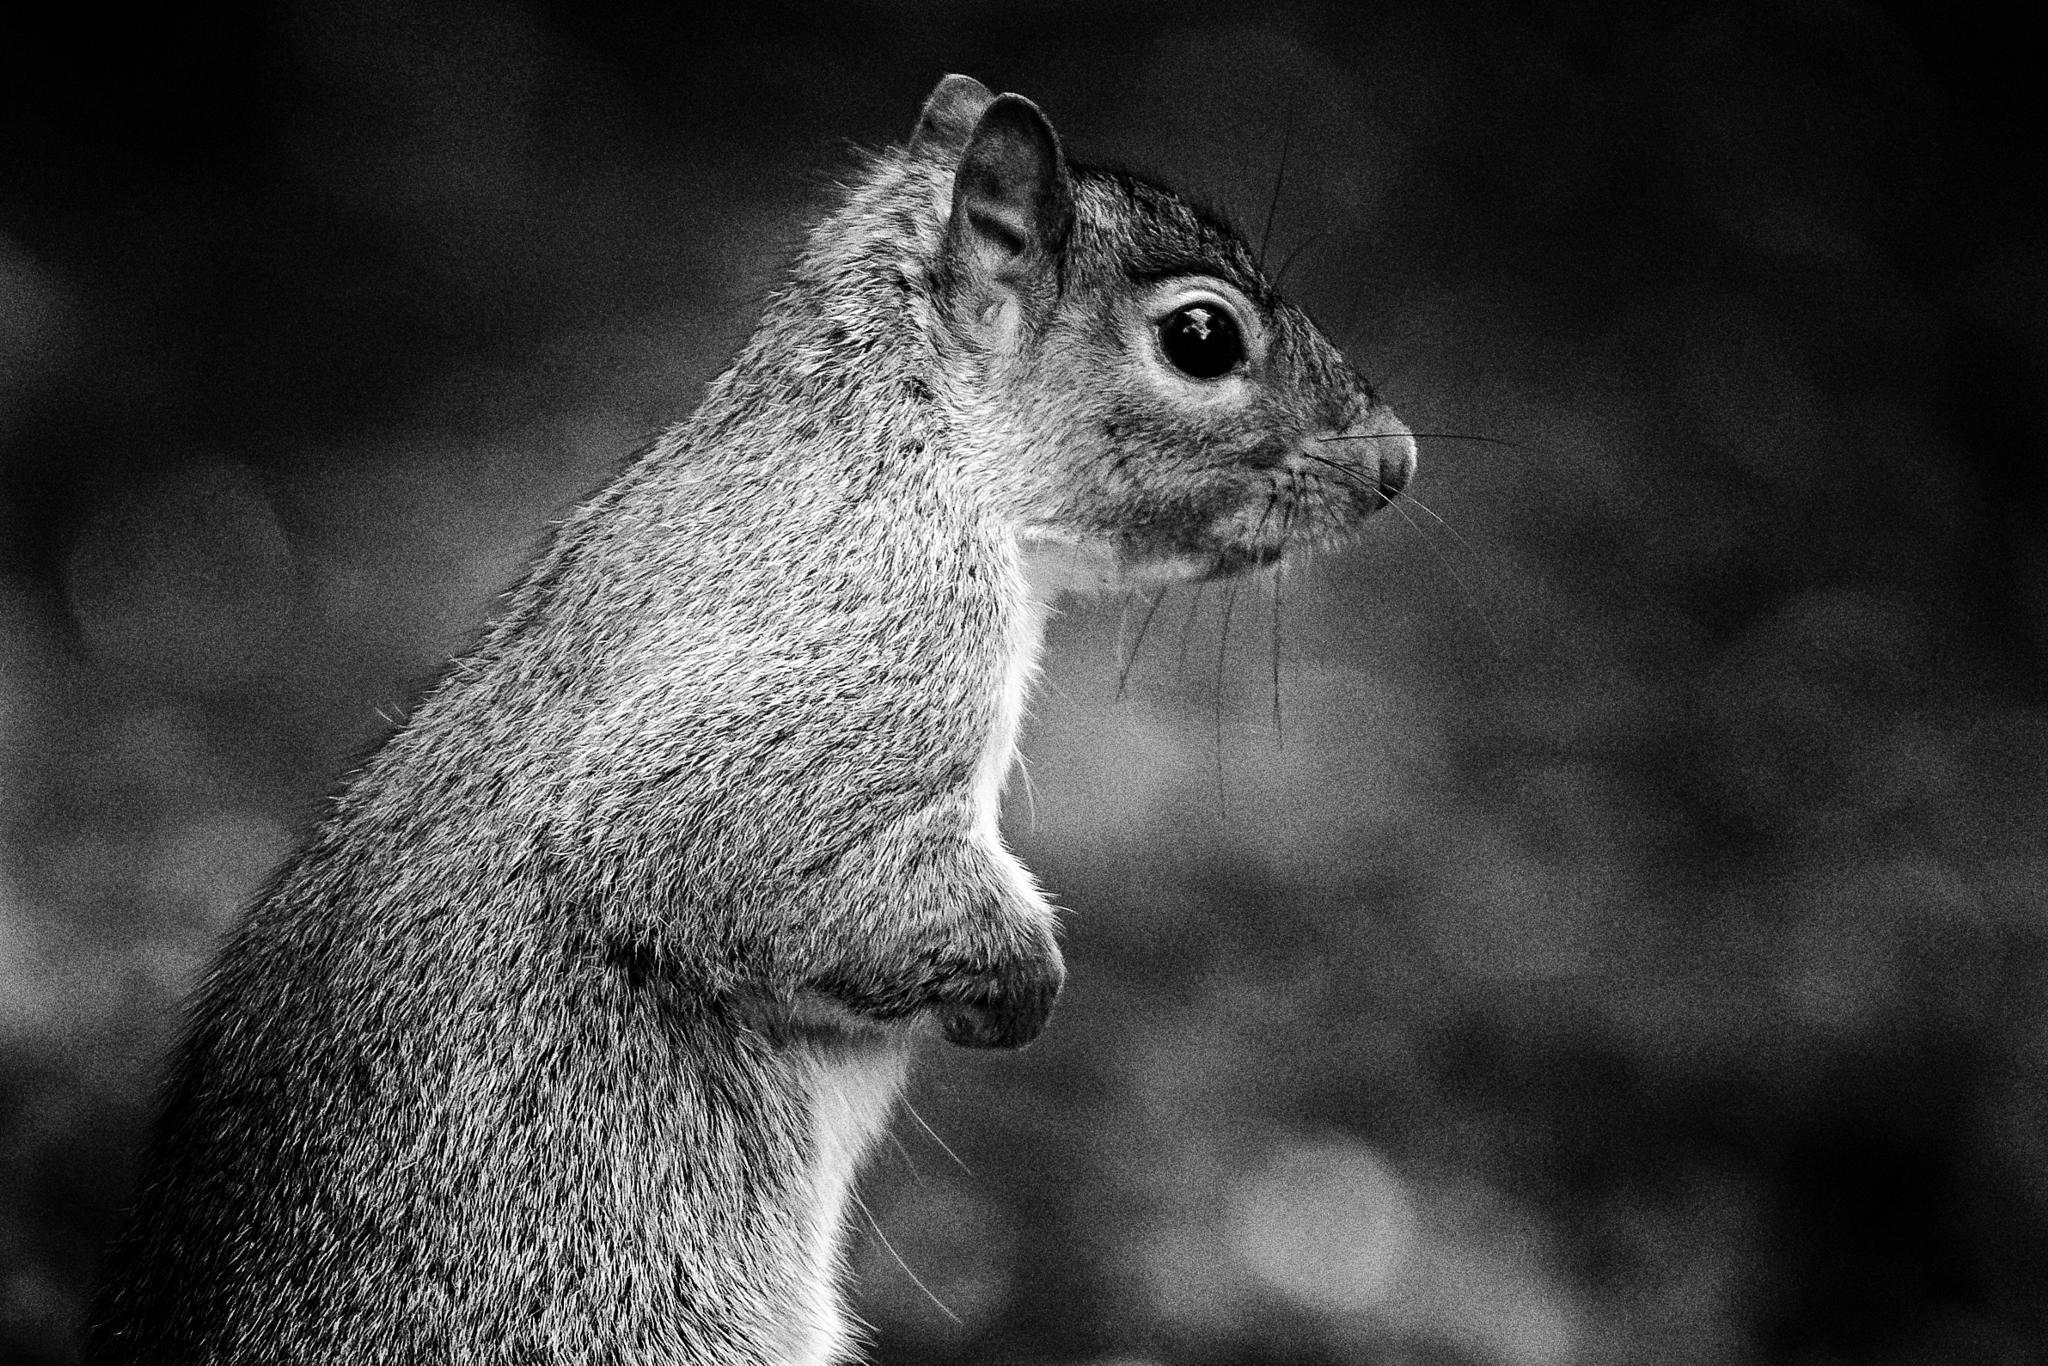 squirrel  by tyson4578